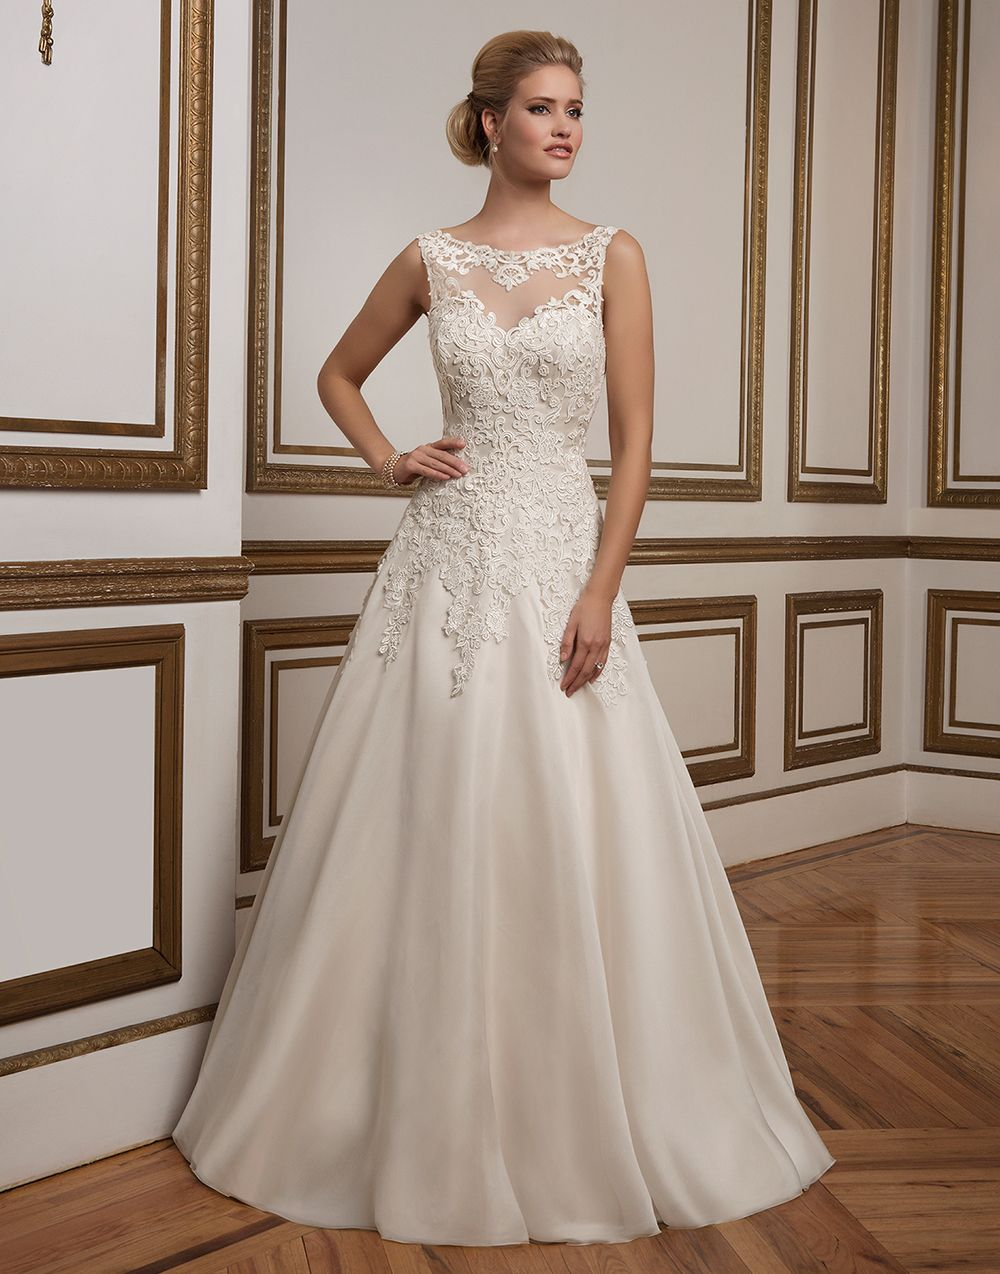 Justin Alexander wedding dresses style 8835 Lace adorns